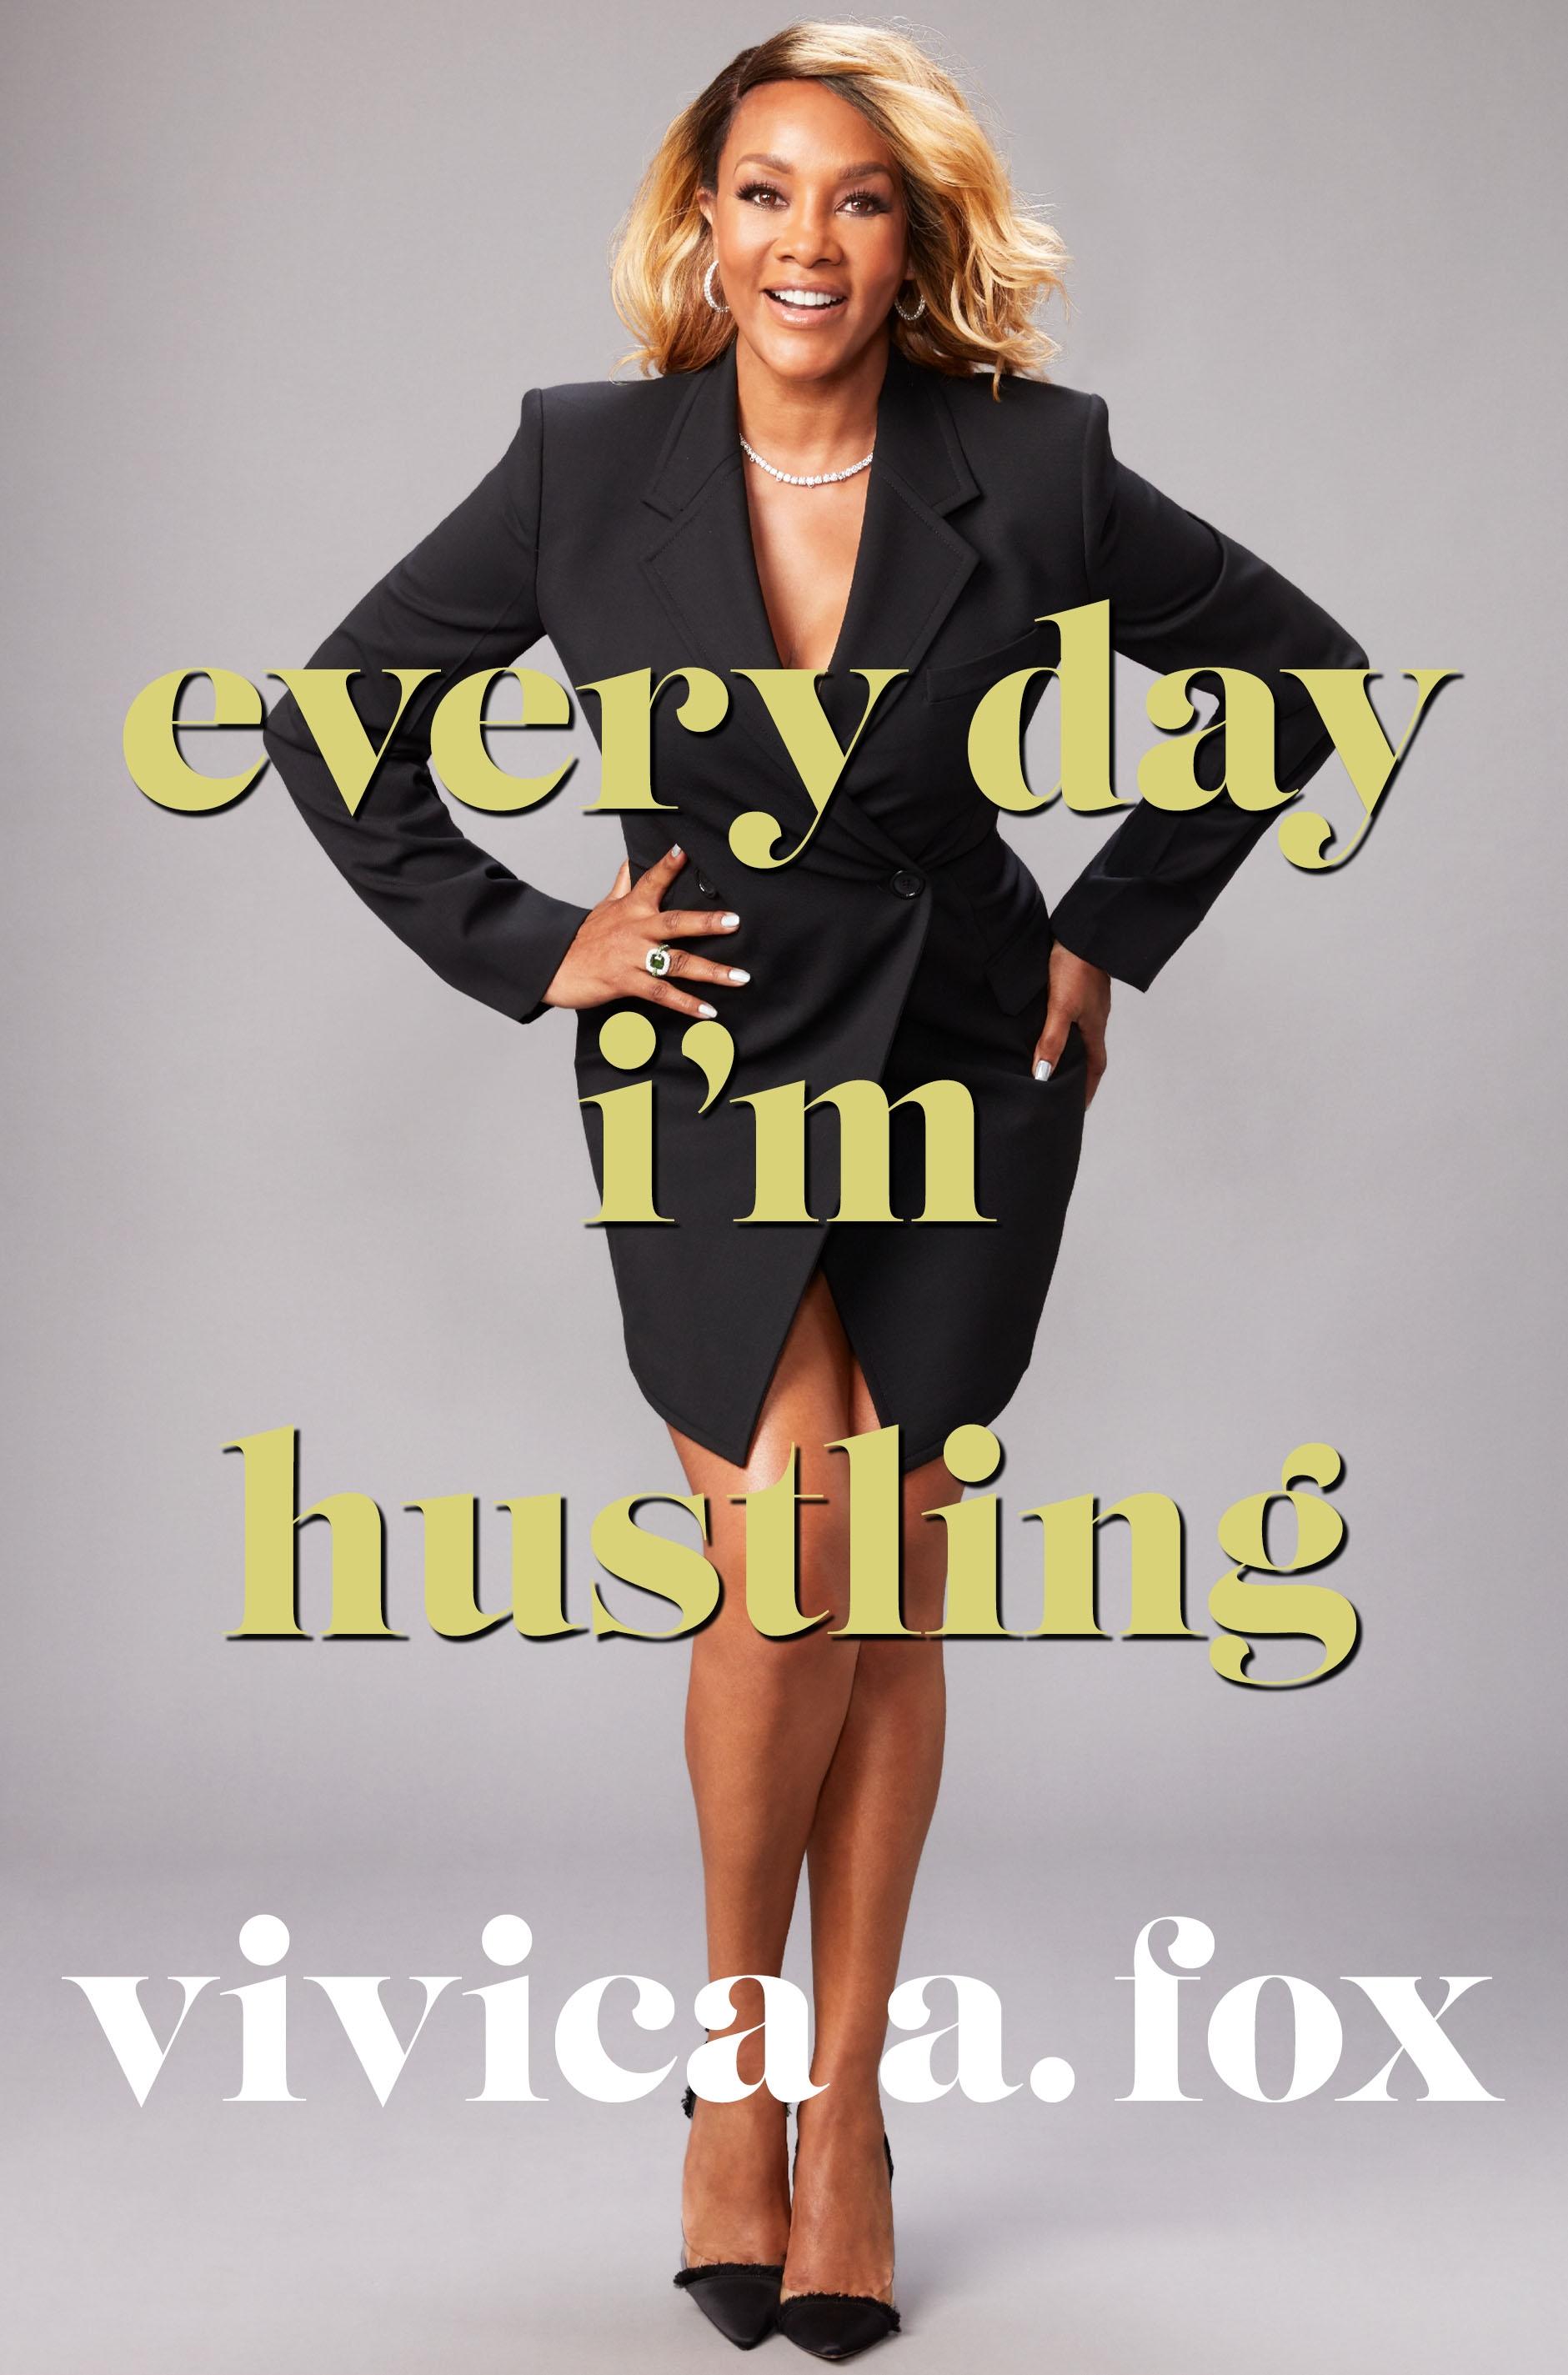 Every Day I'm Hustling cover hi res.jpg